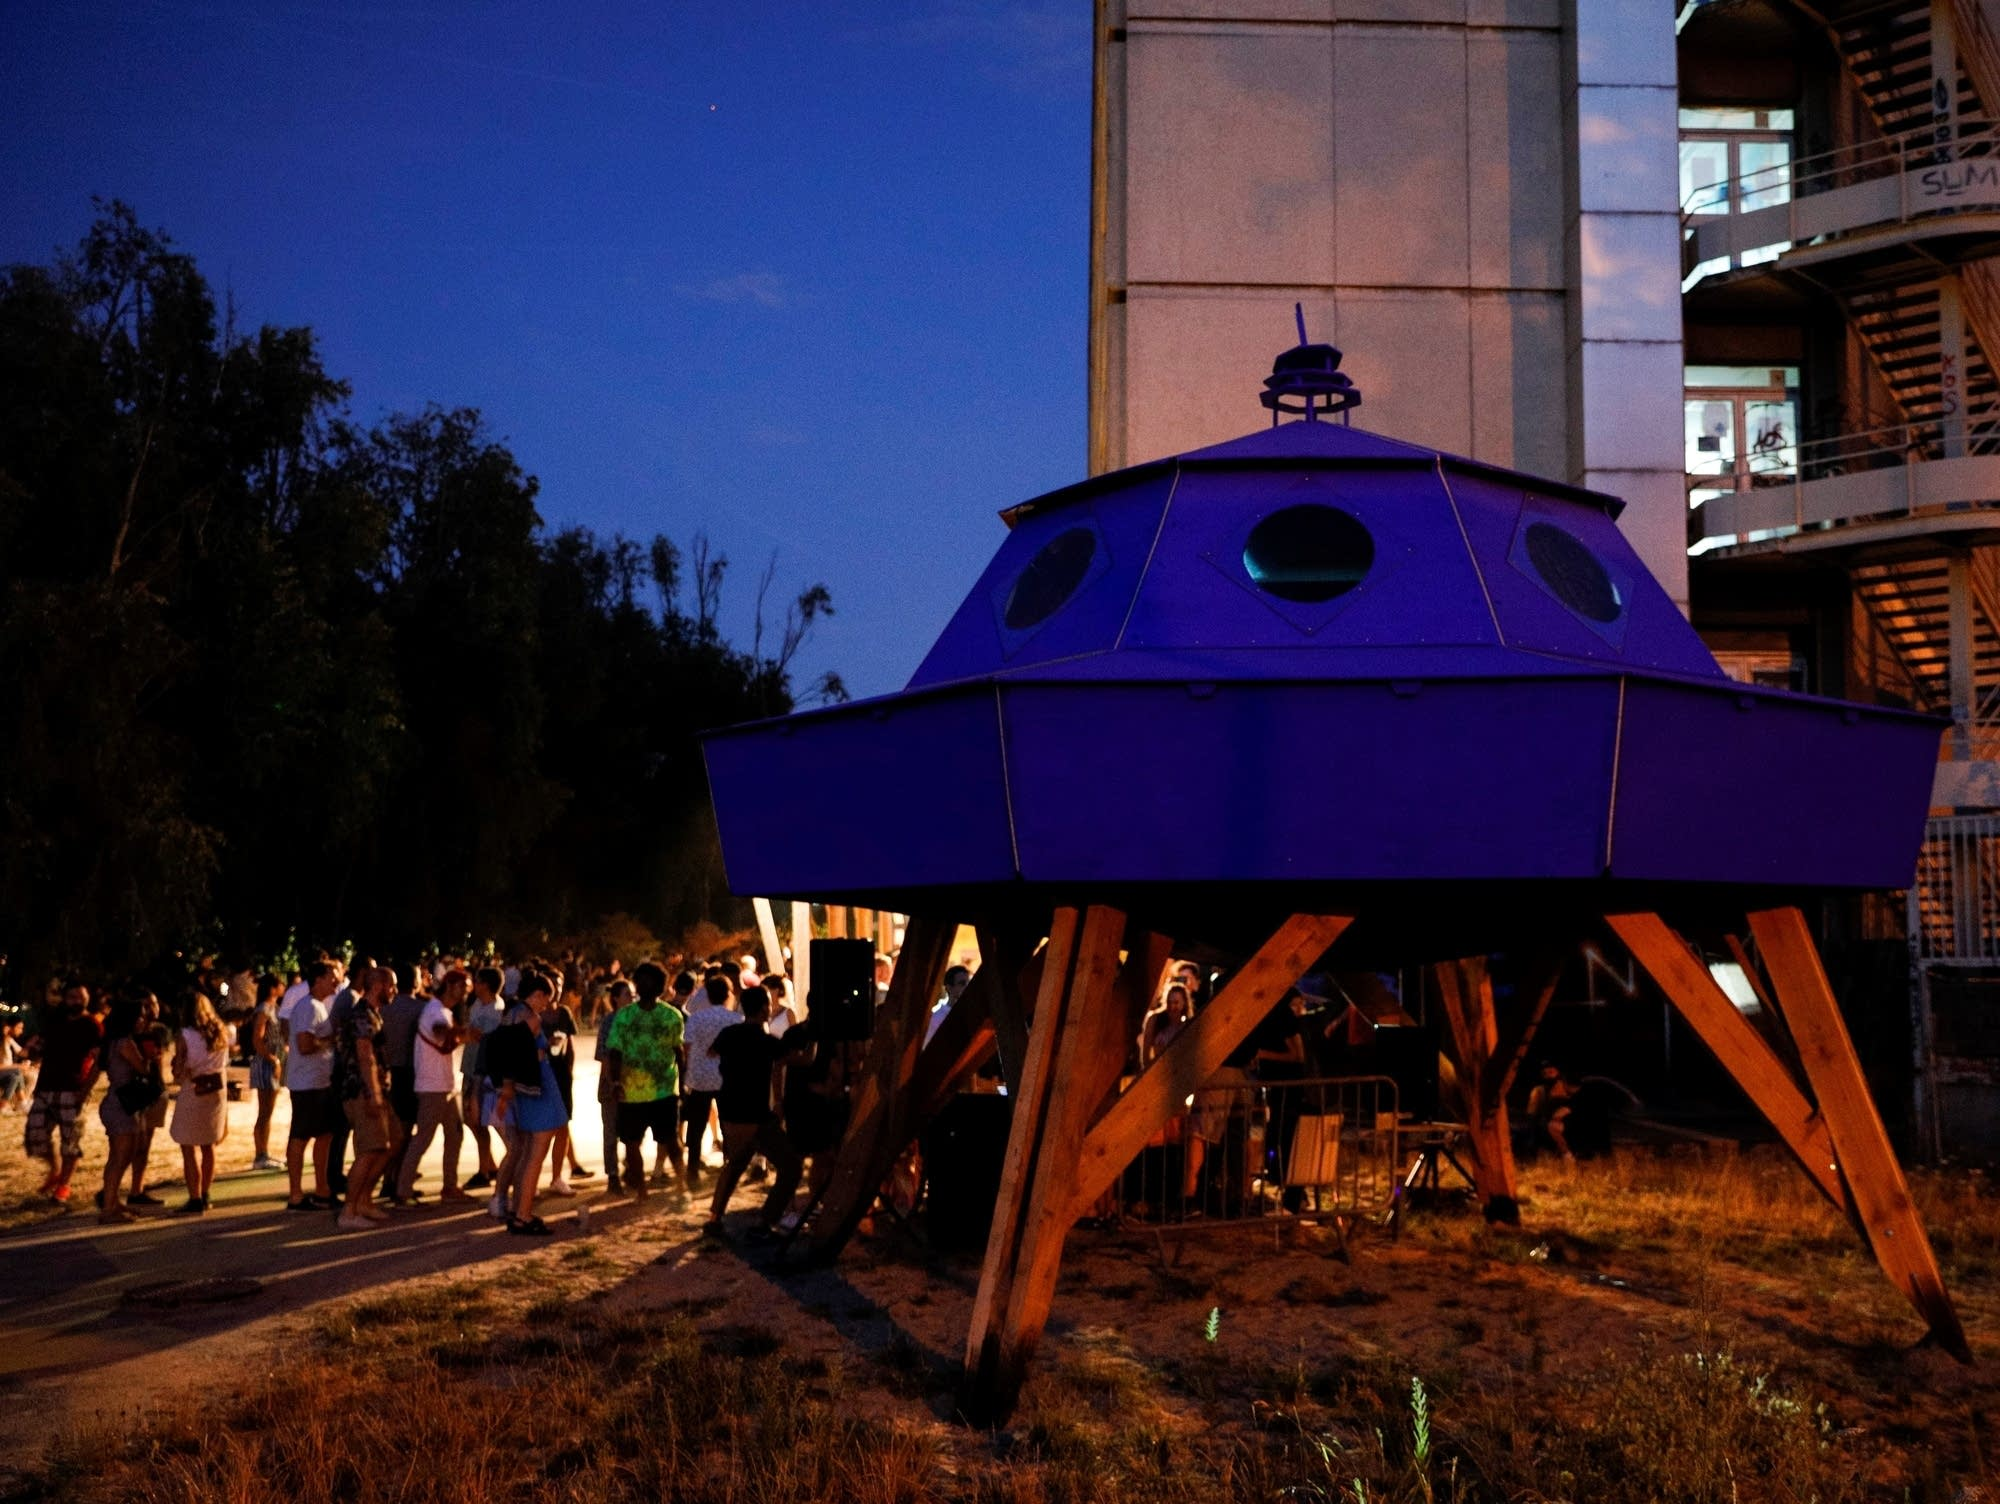 An illicit outdoor techno party near Paris, August 2020.